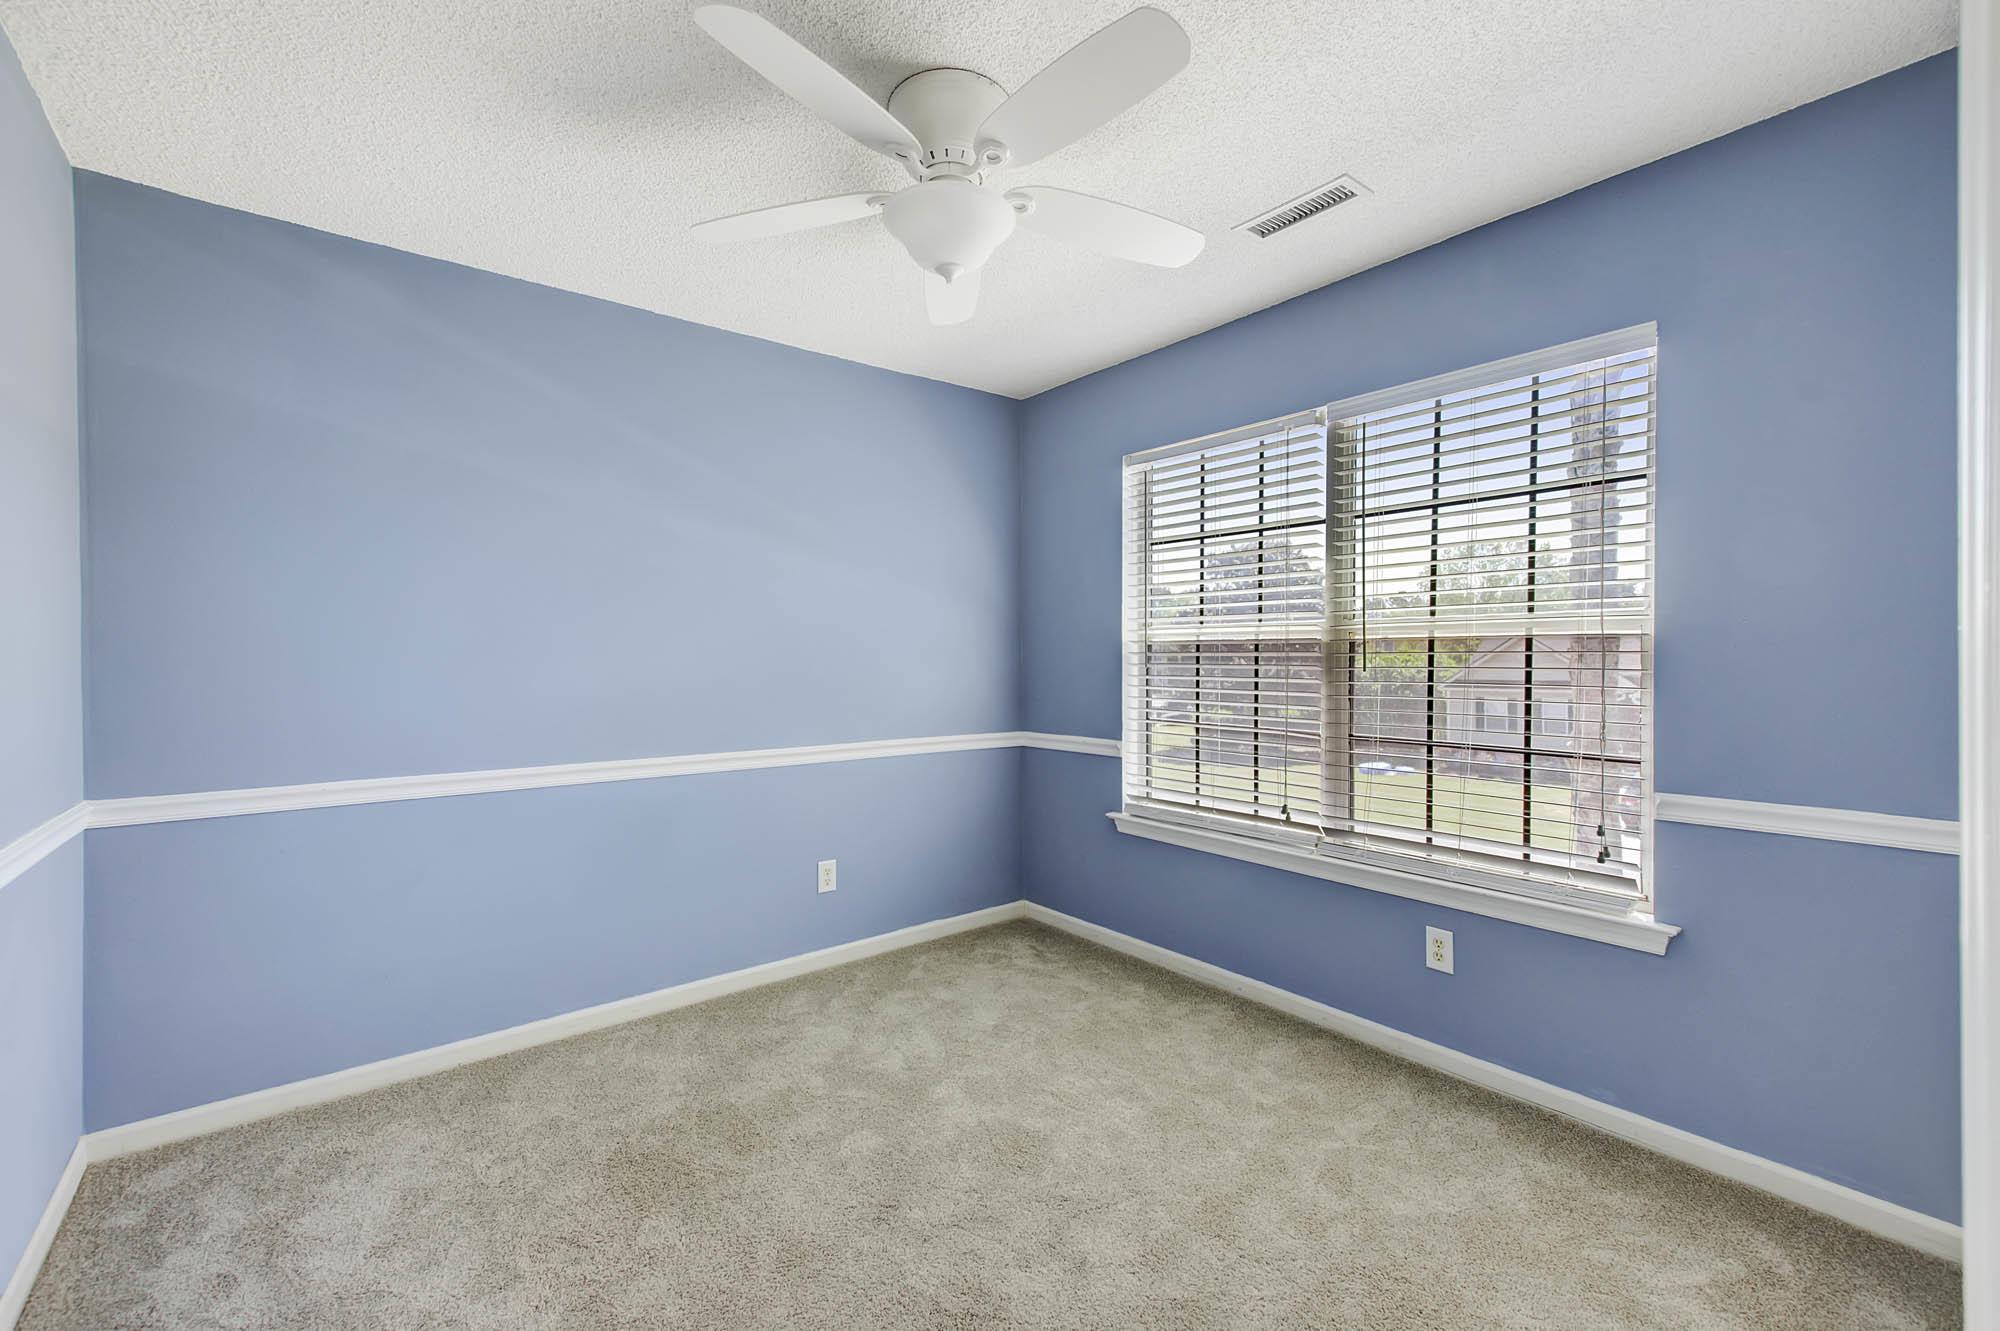 169 Sea Cotton Circle Charleston, SC 29412